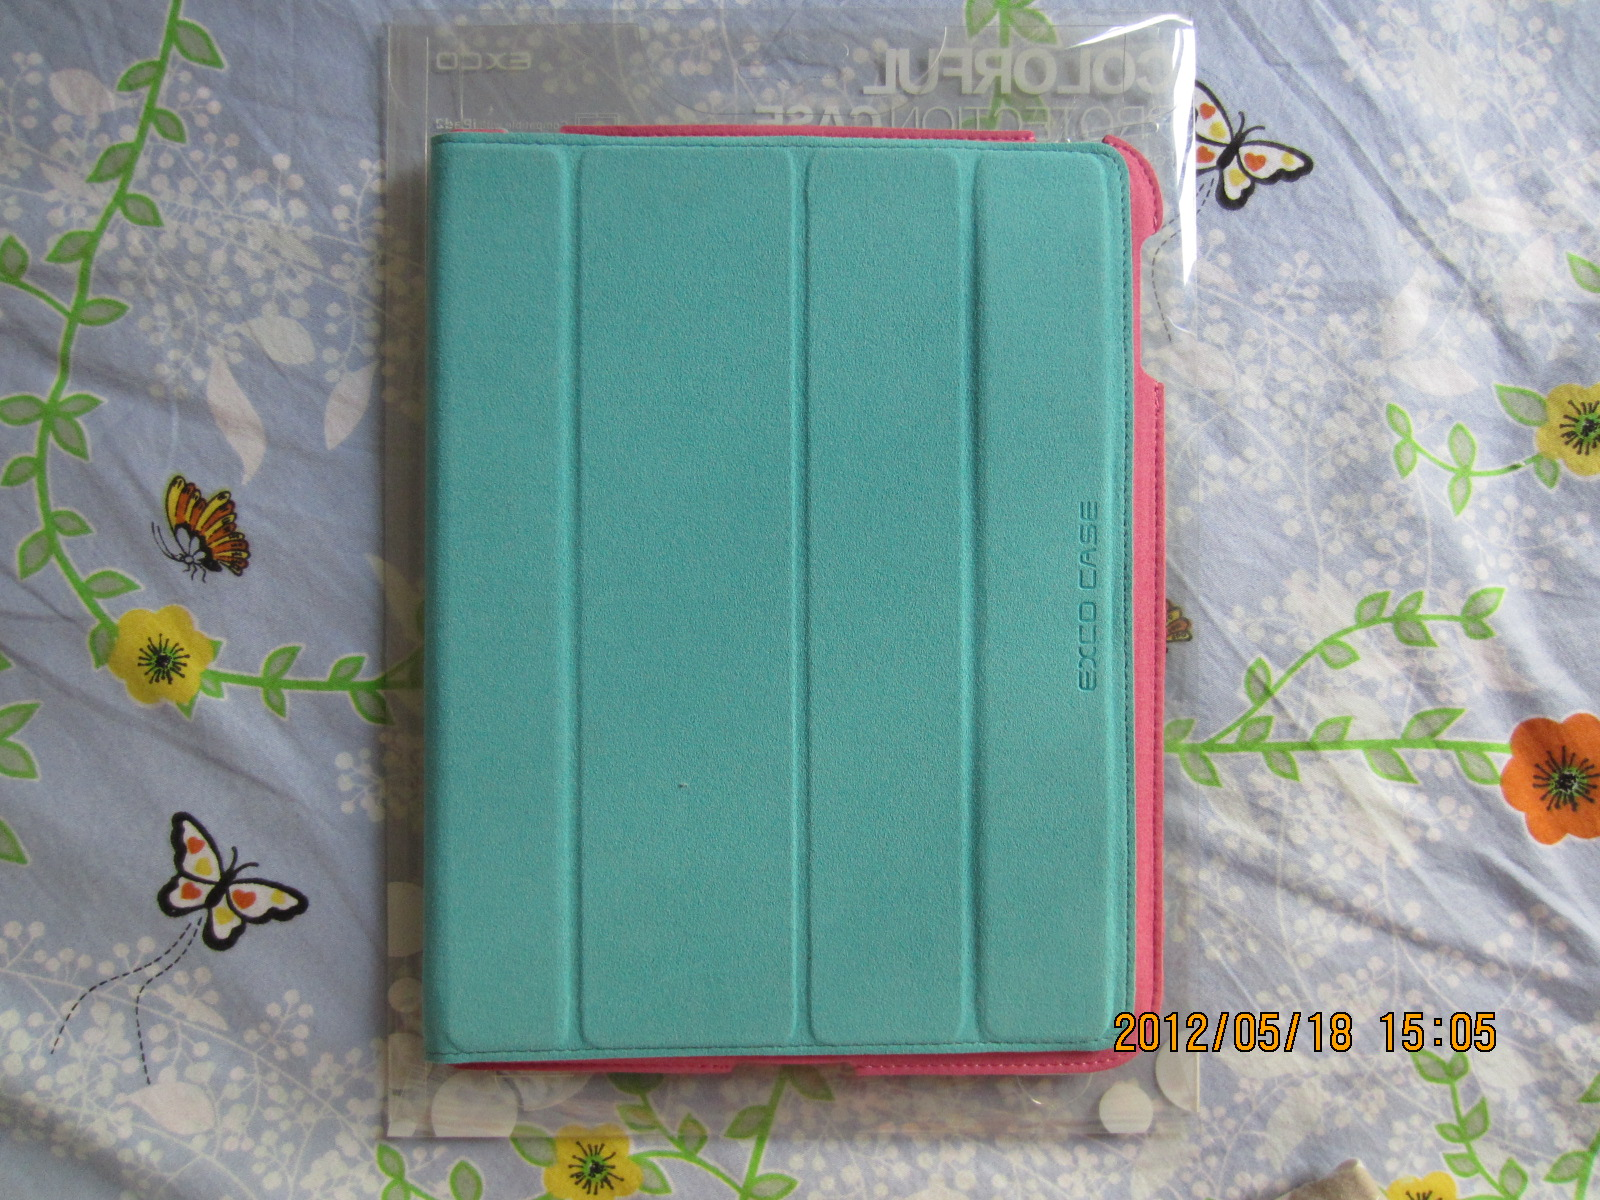 nike free trainer 3.0 clay matthews camo 00252710 shop